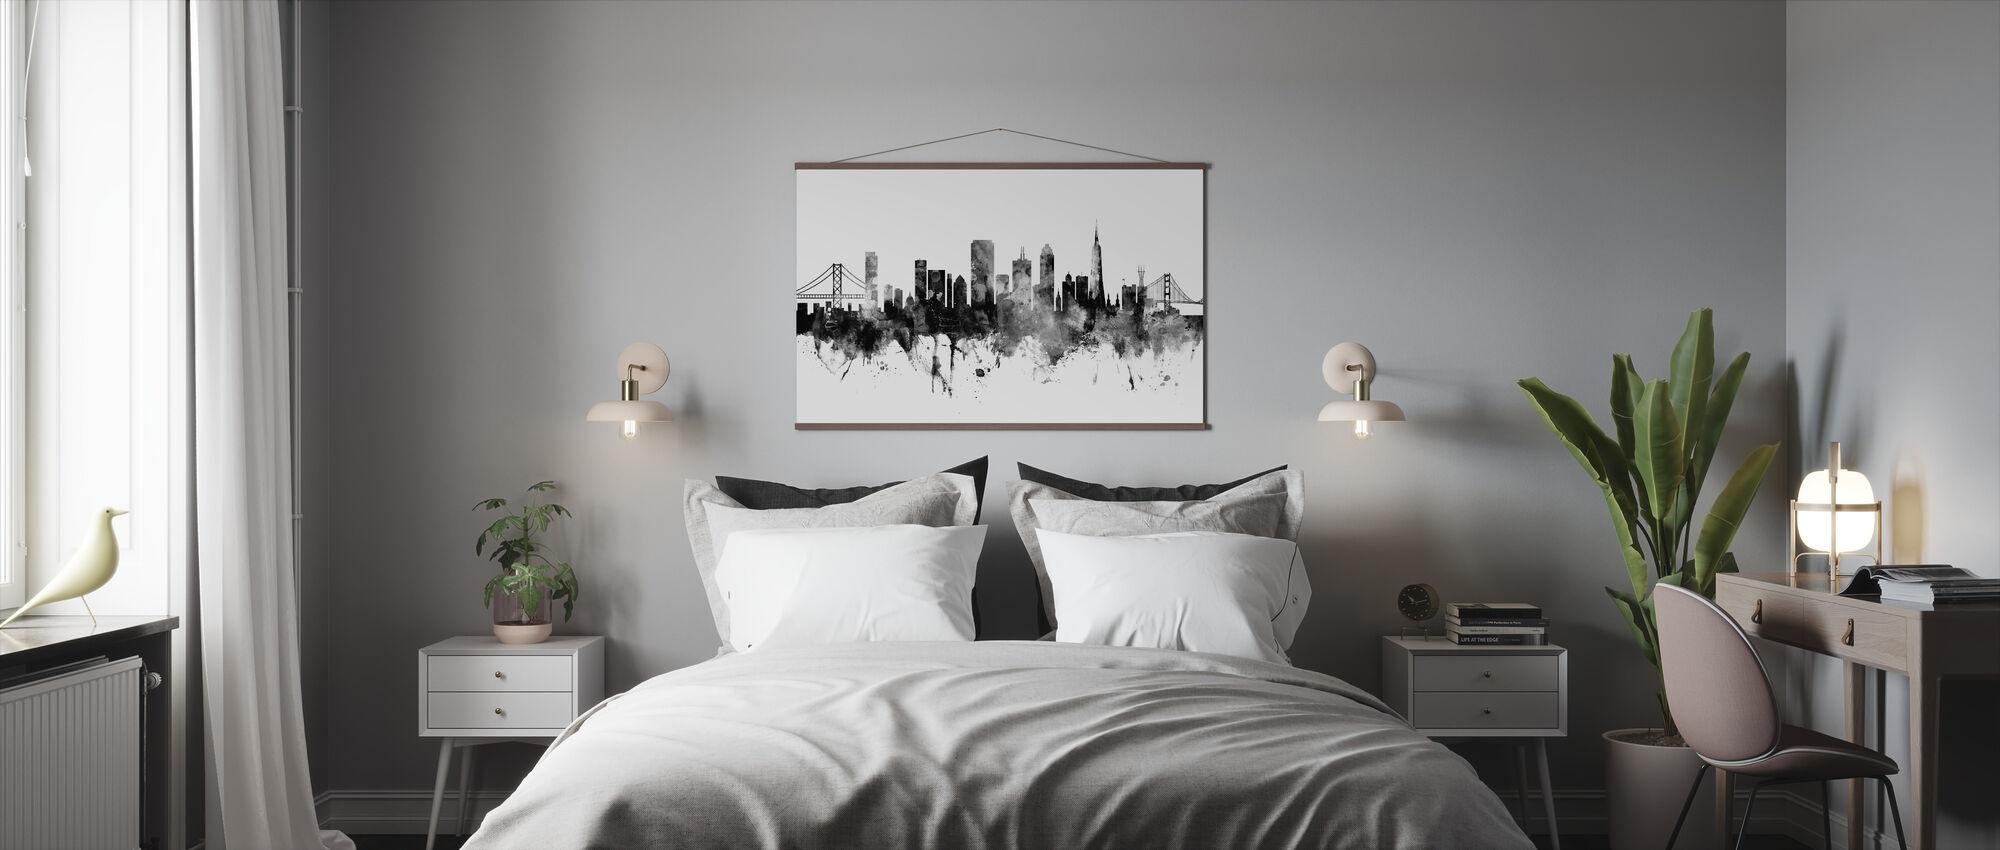 San Francisco City Skyline, black and white - Poster - Bedroom